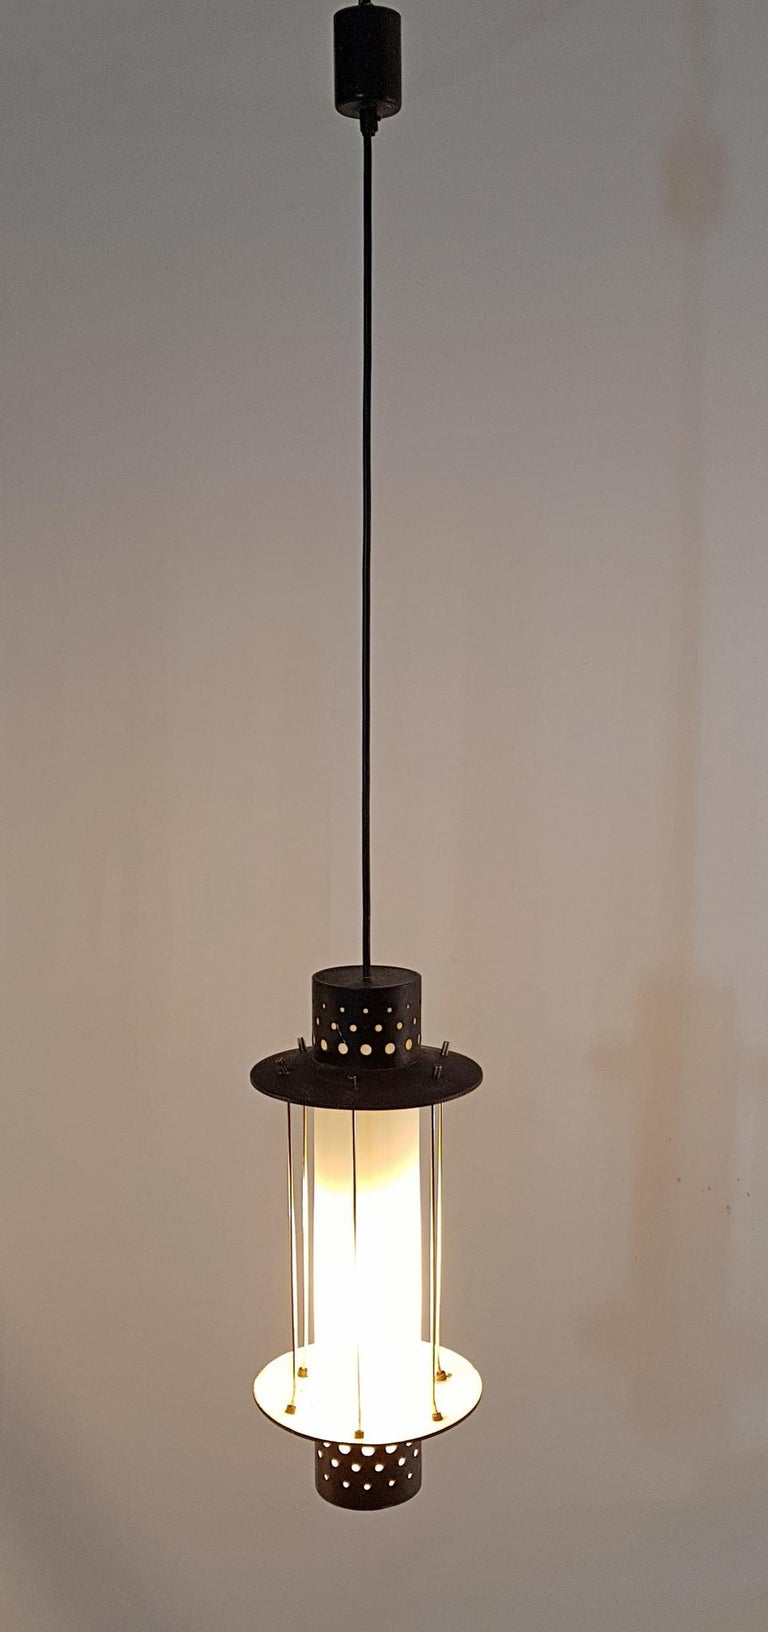 Mid-Century Modern Midcentury Stilnovo Pendant, Italy For Sale